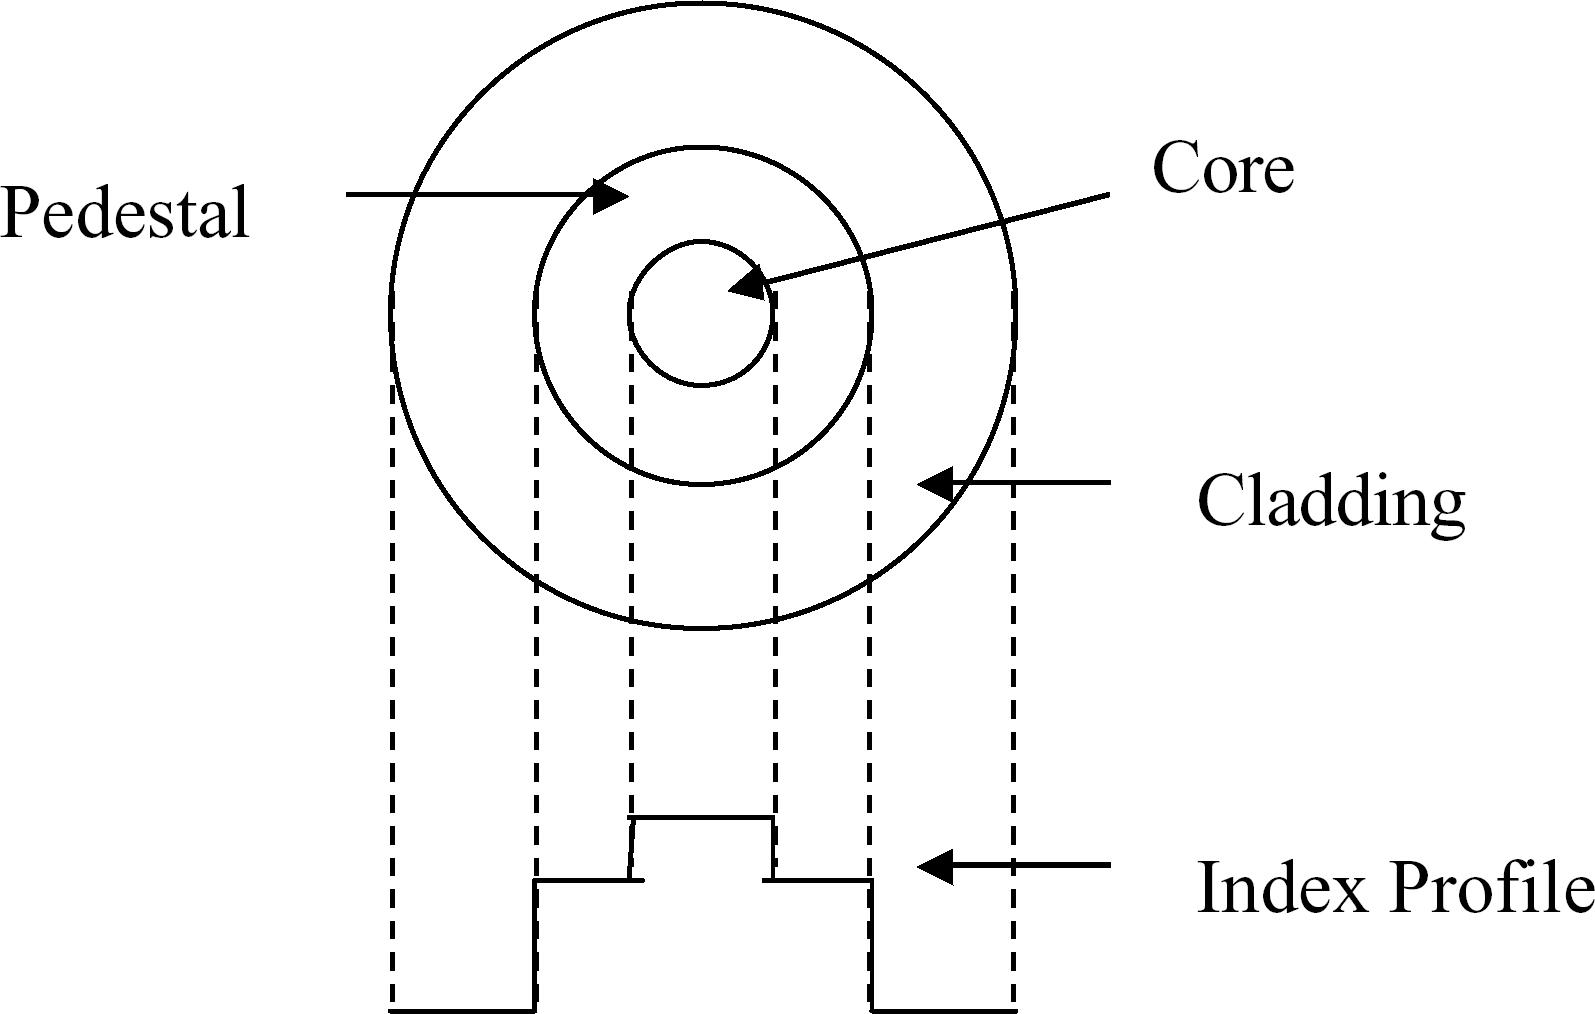 Optical fibers for high-power eye-safe lasing applications